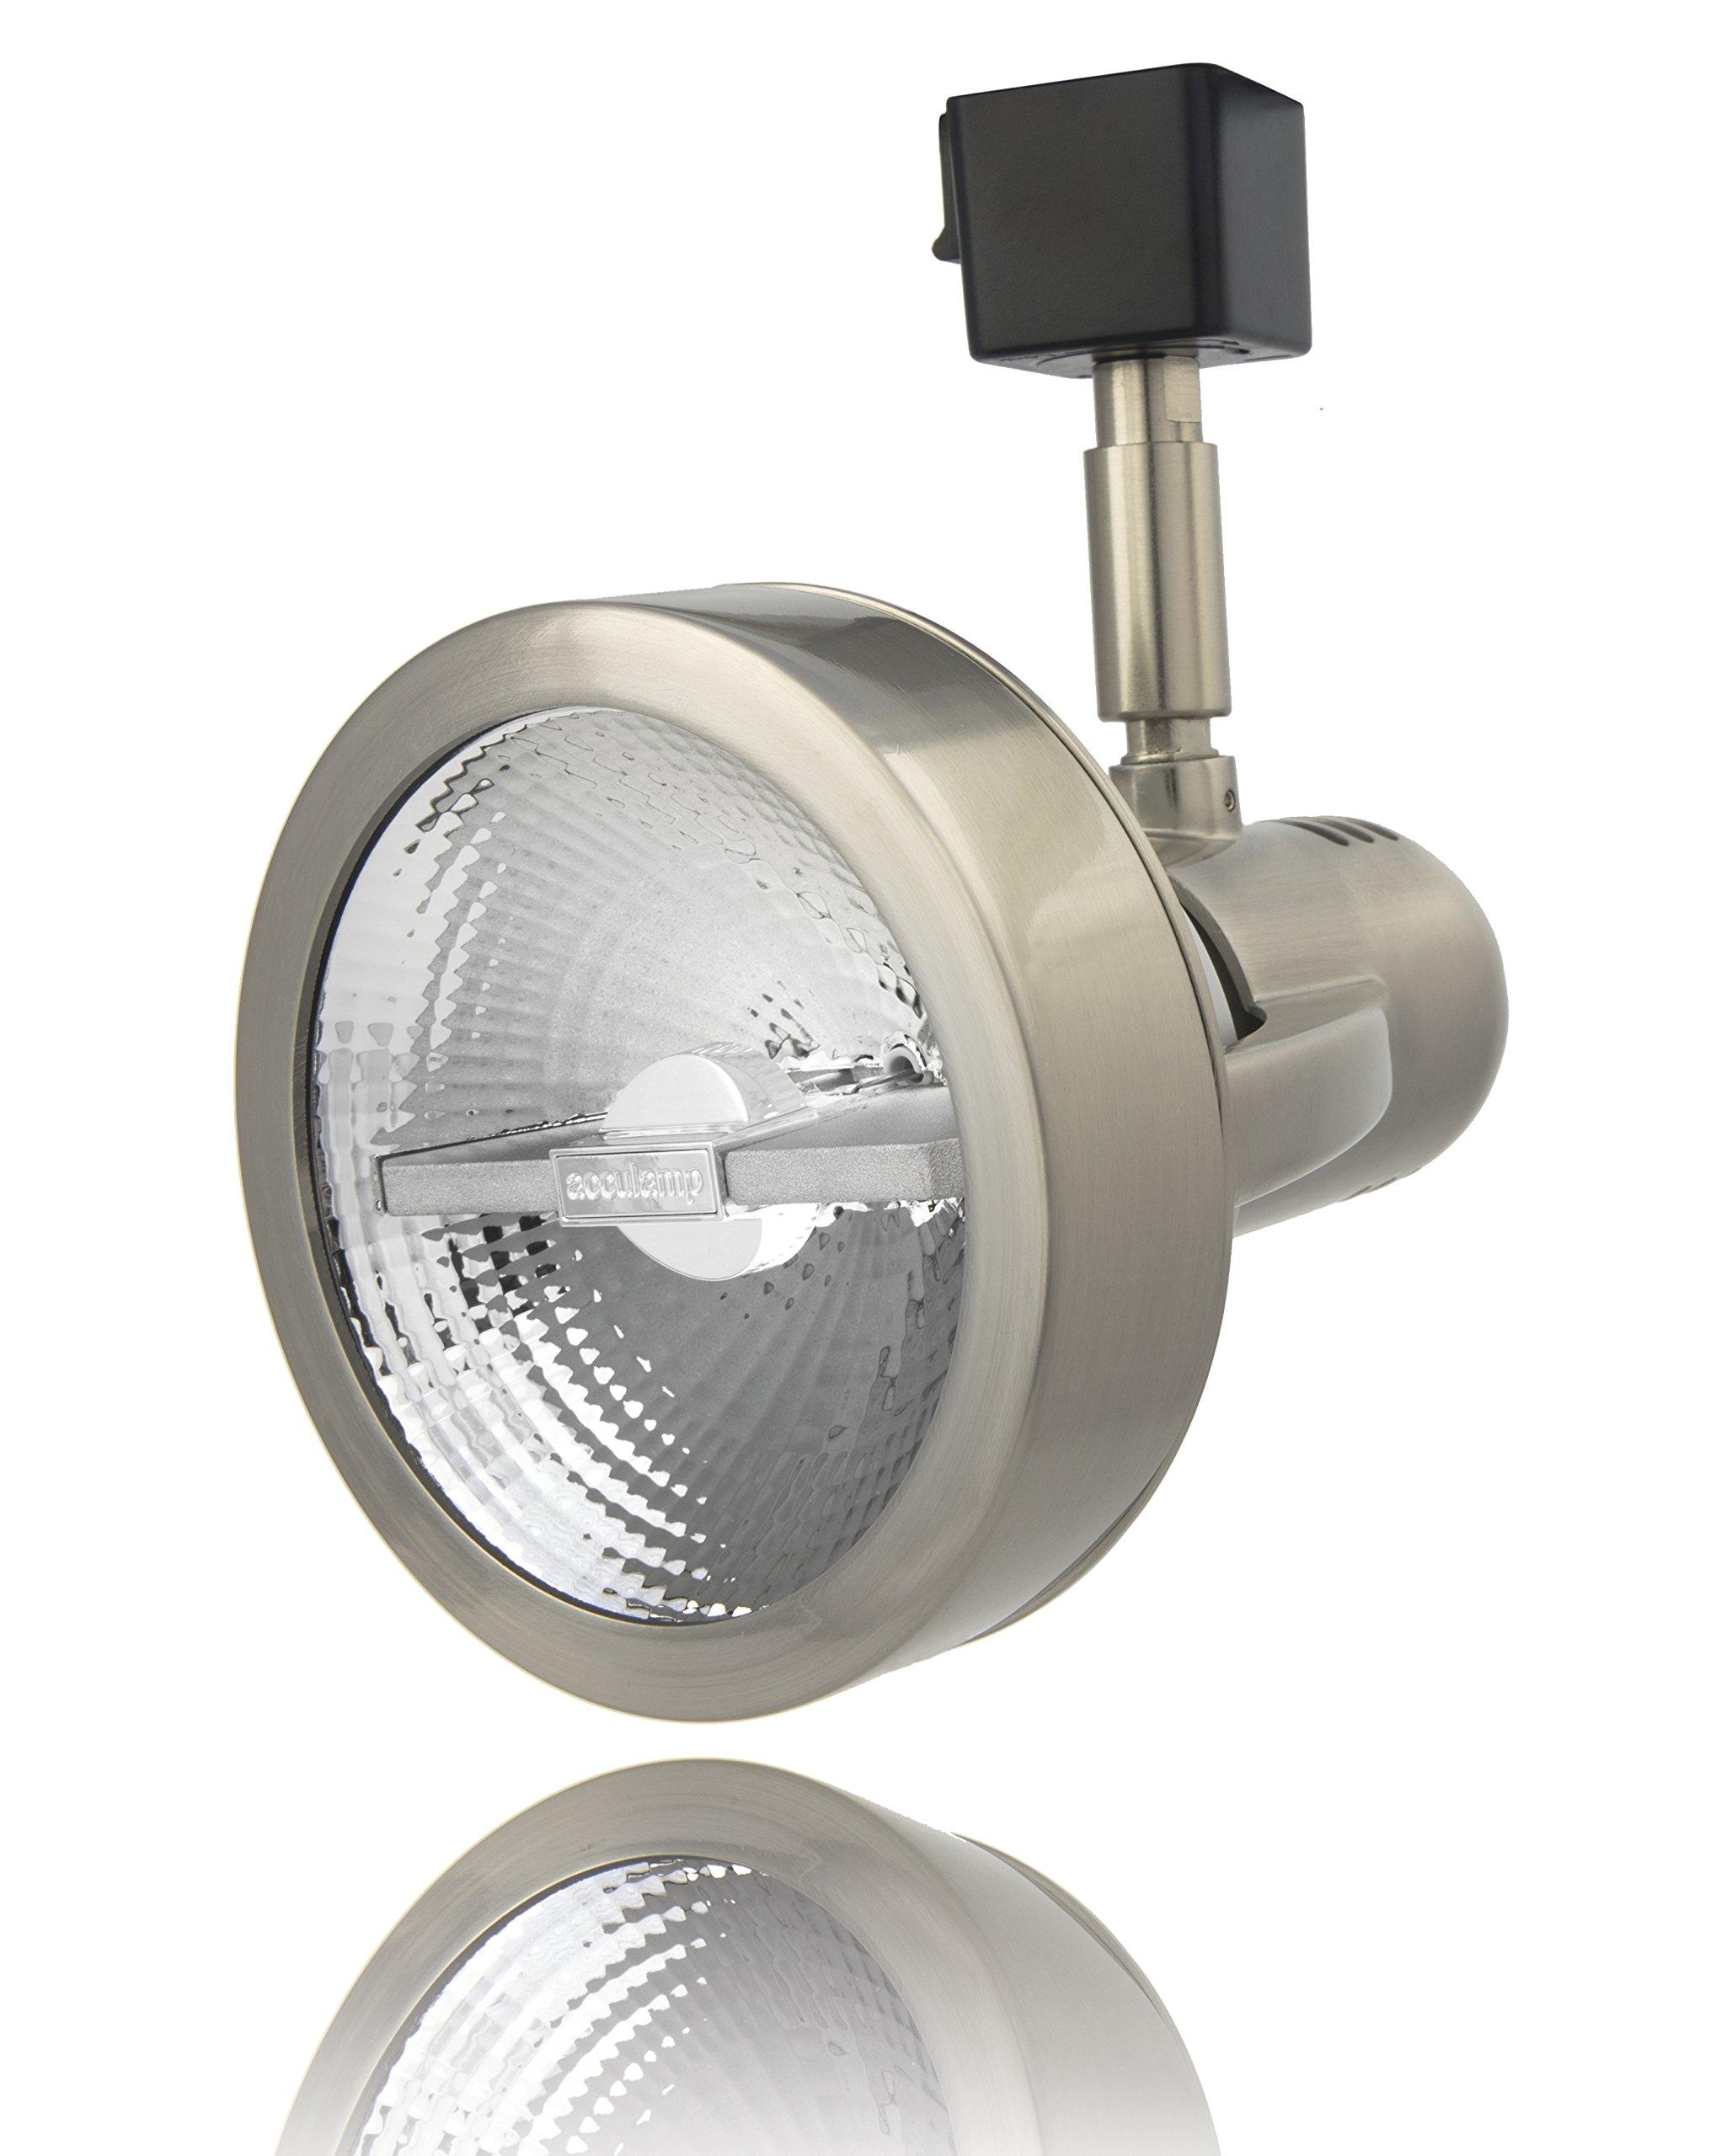 Lithonia Lighting LTH4000 PAR30 BN M24 1-Light Front Loading Commercial Track Head, 1-2 Circuit, Aluminium, PAR30-Compatible Led, Brushed Nickel